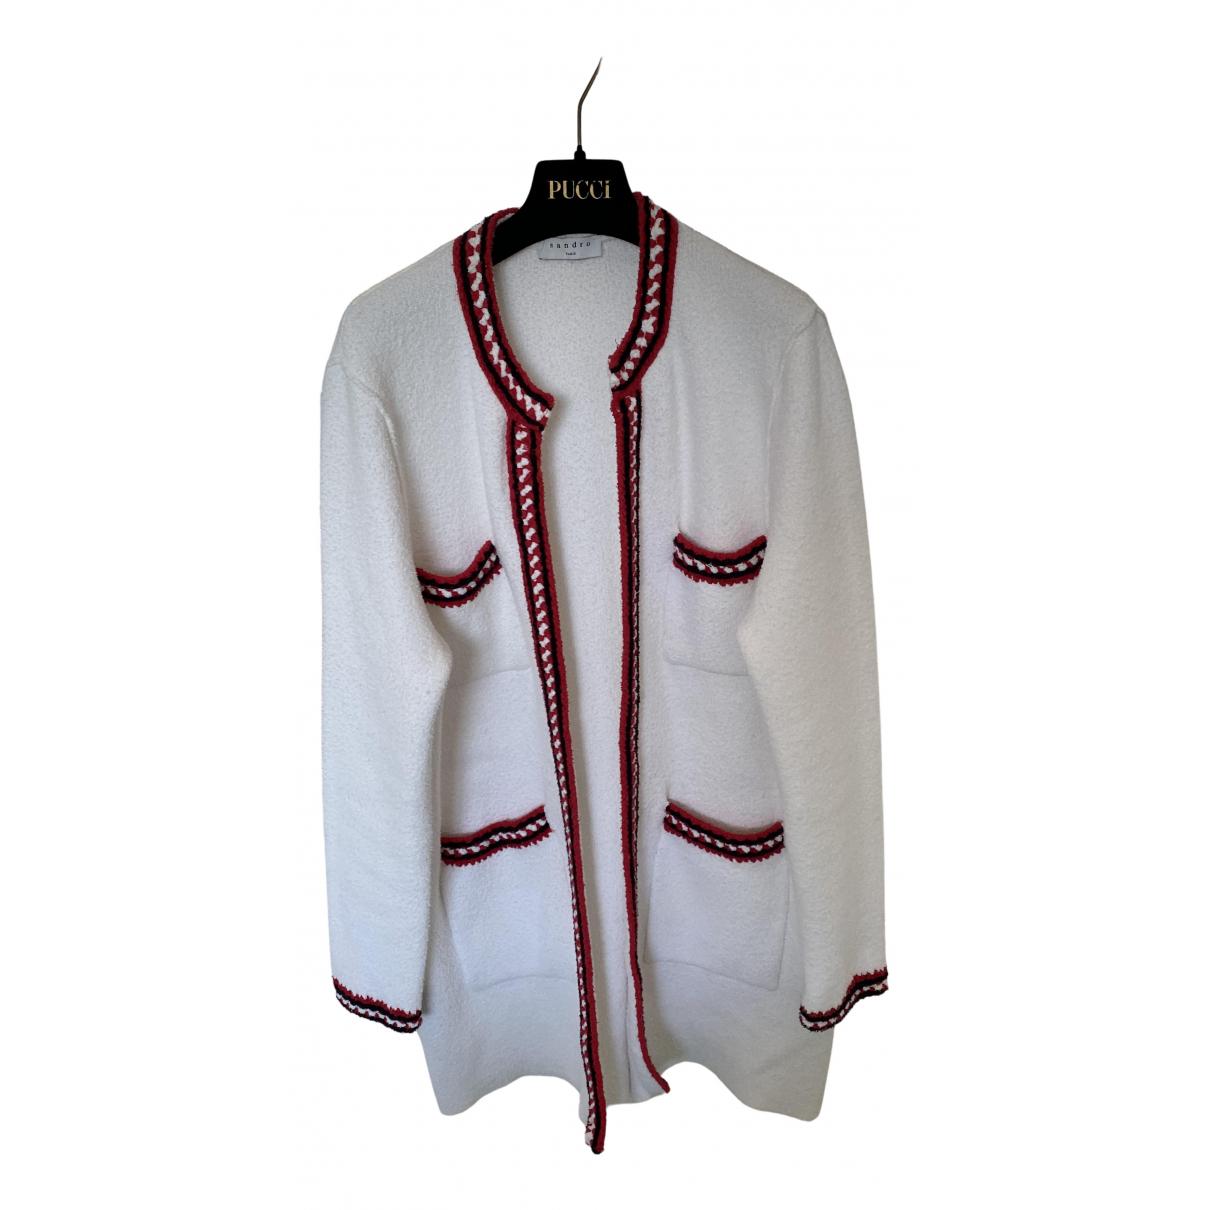 Sandro Fall Winter 2019 White Cotton jacket for Women 36 FR